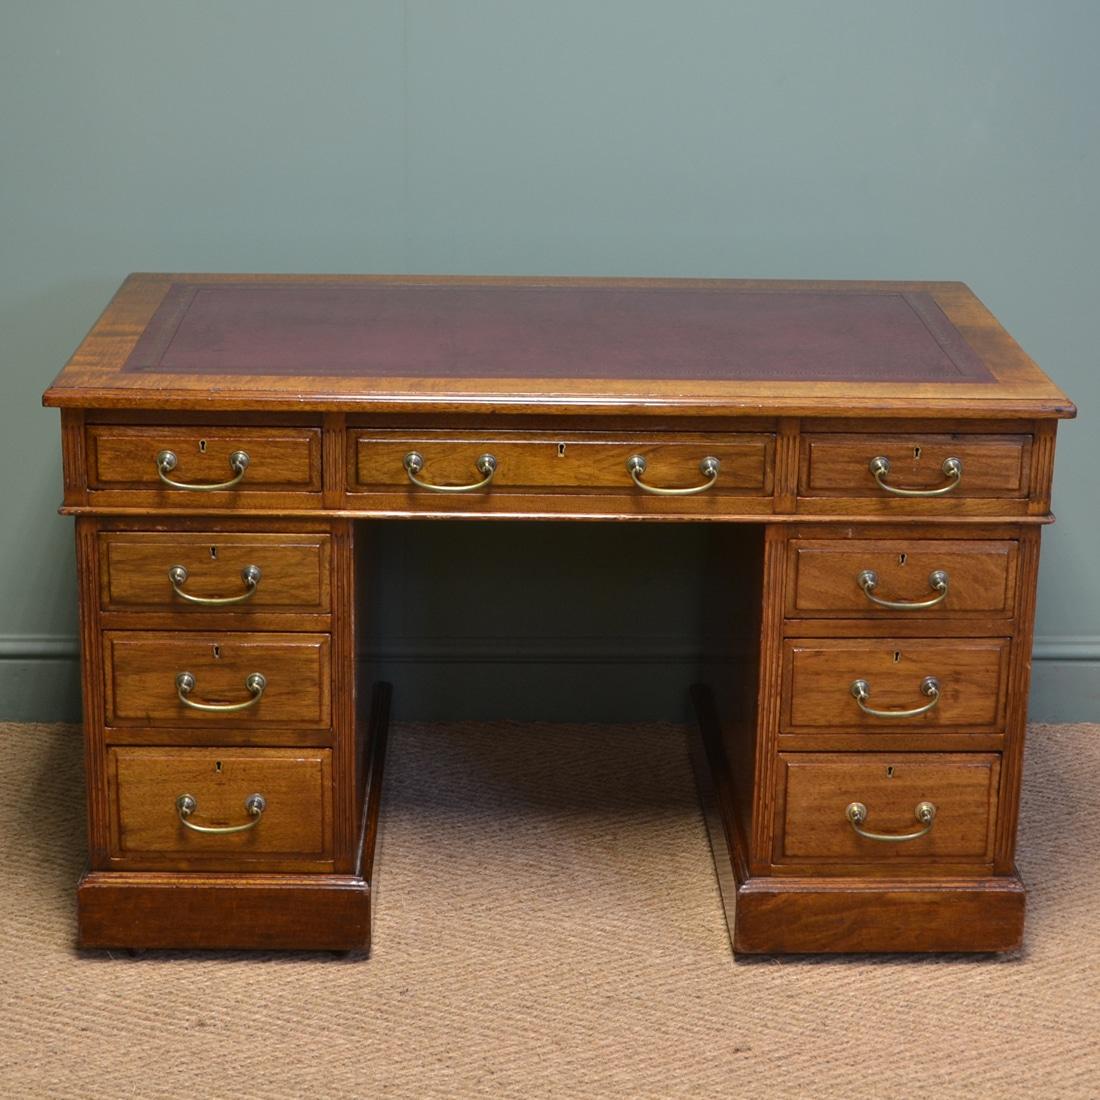 Walnut Antique Victorian Pedestal Desk by S & H Jewell of London